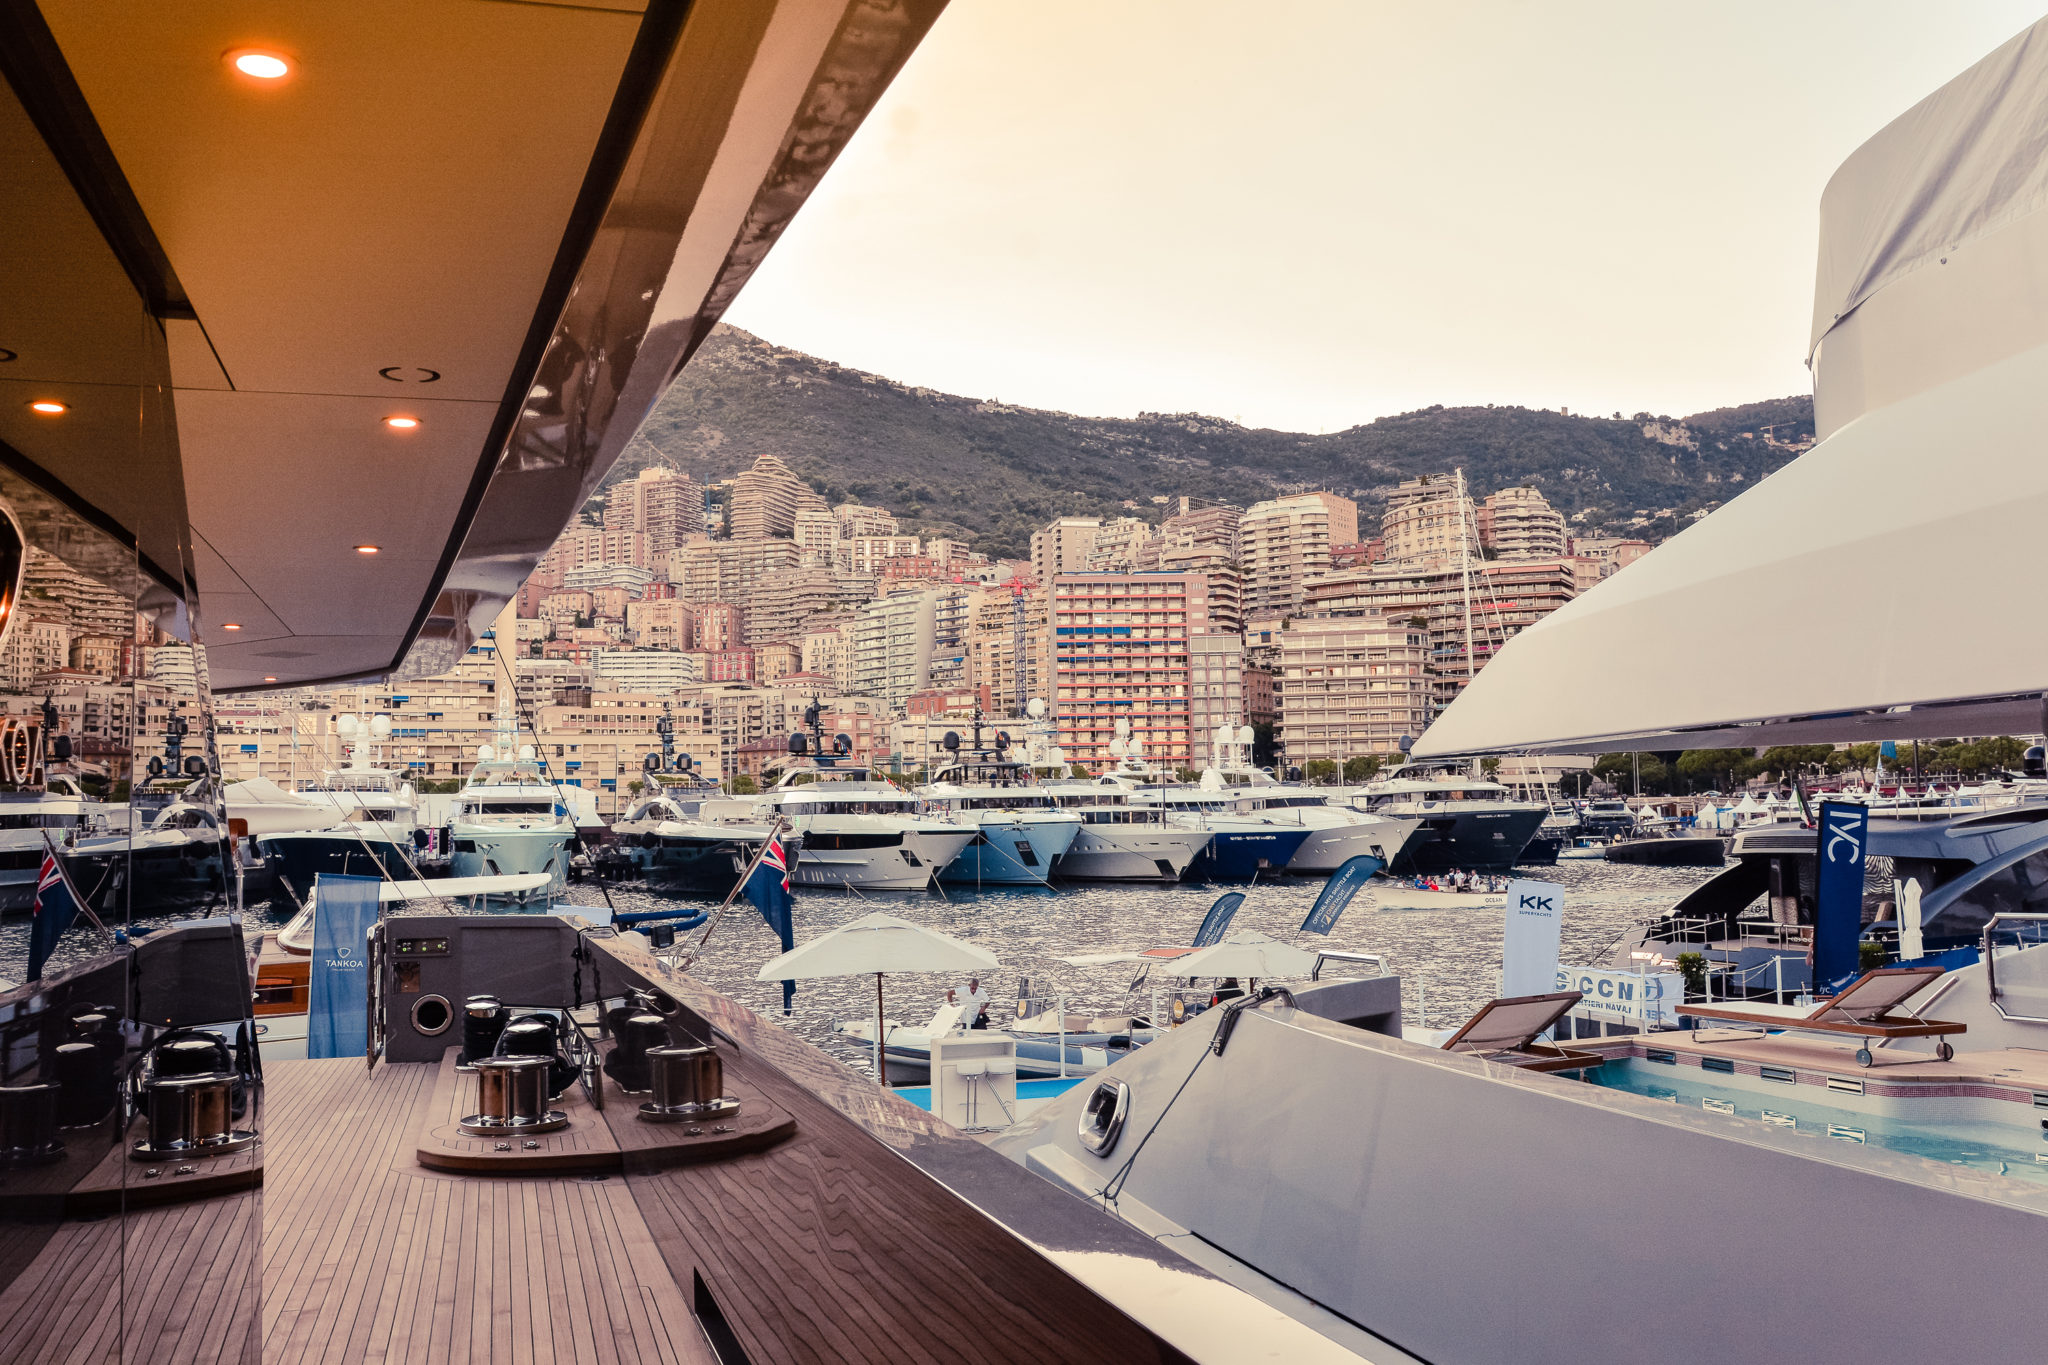 Tenuta Torciano @ Monaco Yacht Show 2018